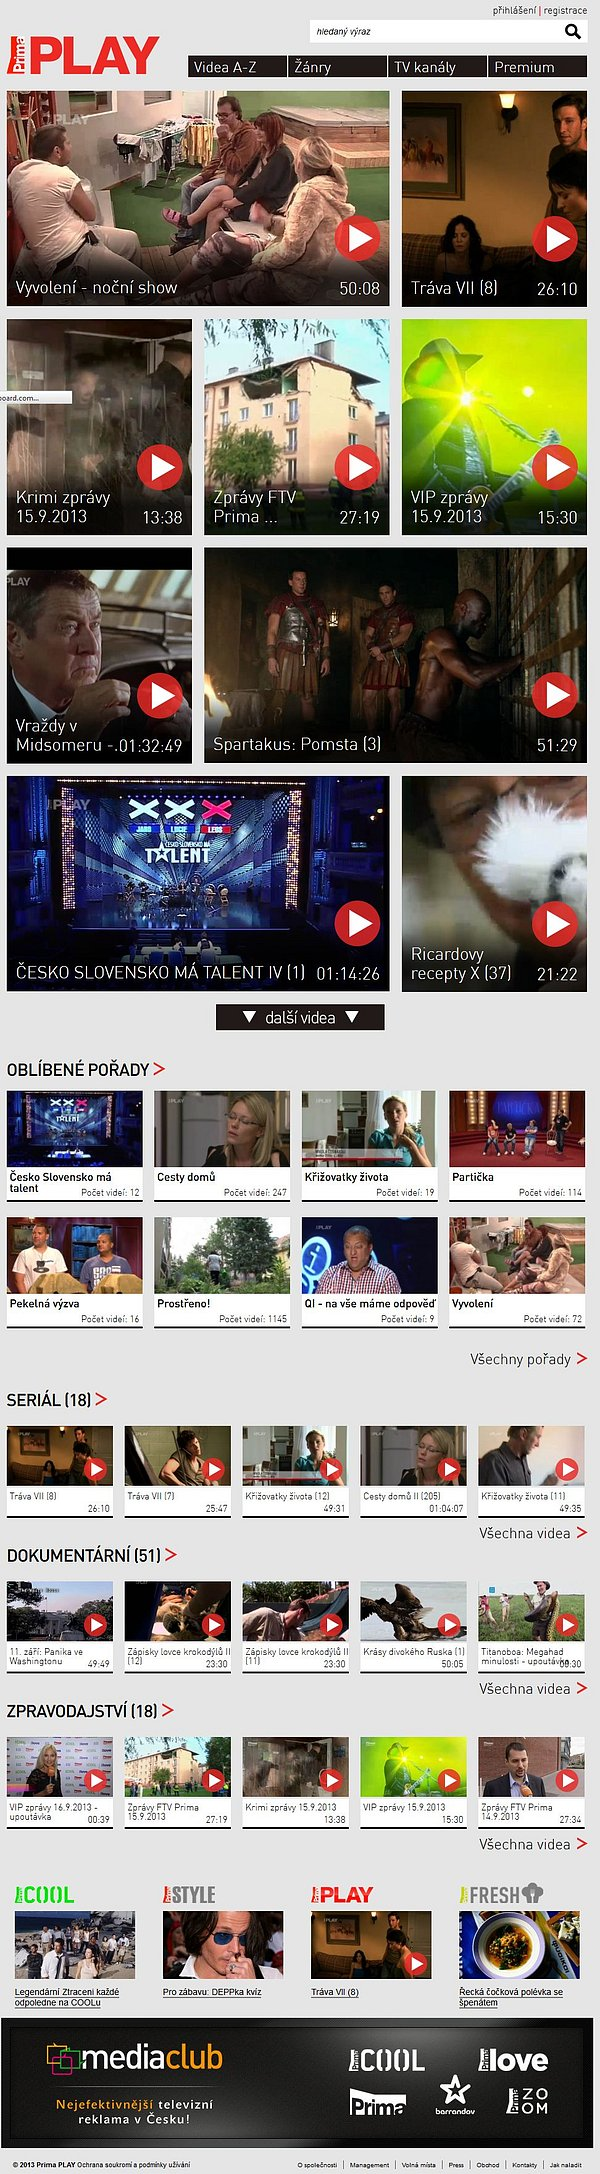 Nová podoba videoportálu Prima Play